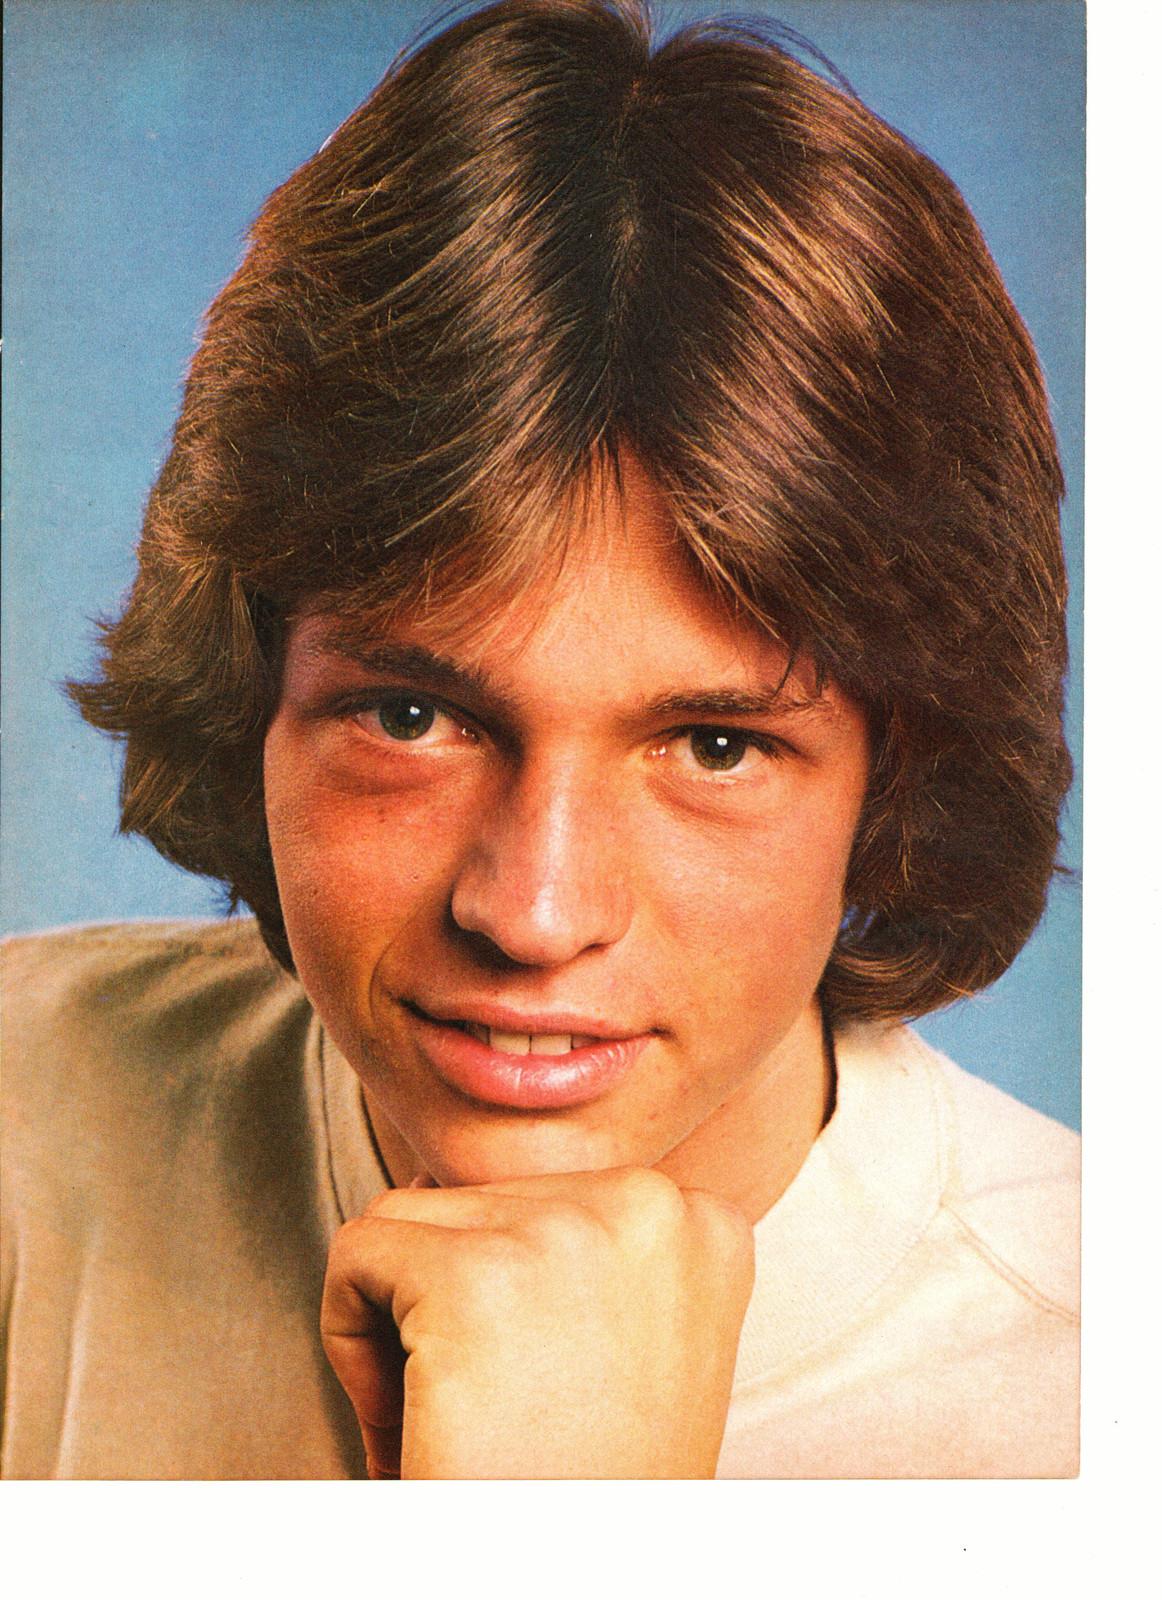 Jimmy Mcnichol Clark Brandon teen magazine pinup clipping smooth jacket 1970's